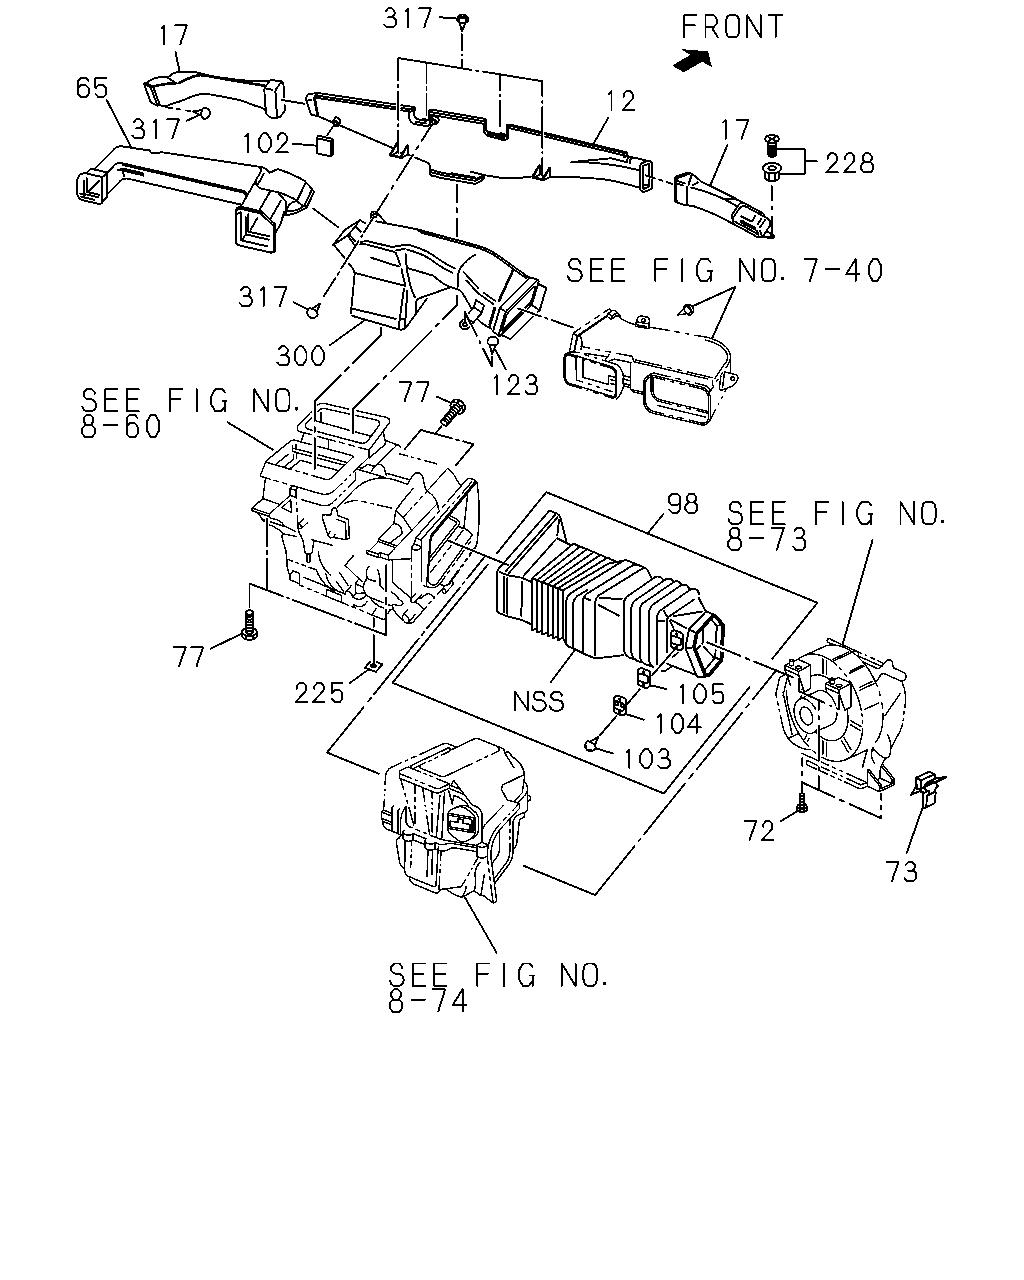 Isuzu Nqr Fuse Diagram Wiring Database Jeep Cherokee 2001: 1997 Isuzu Trooper Engine Diagram At Chusao.net